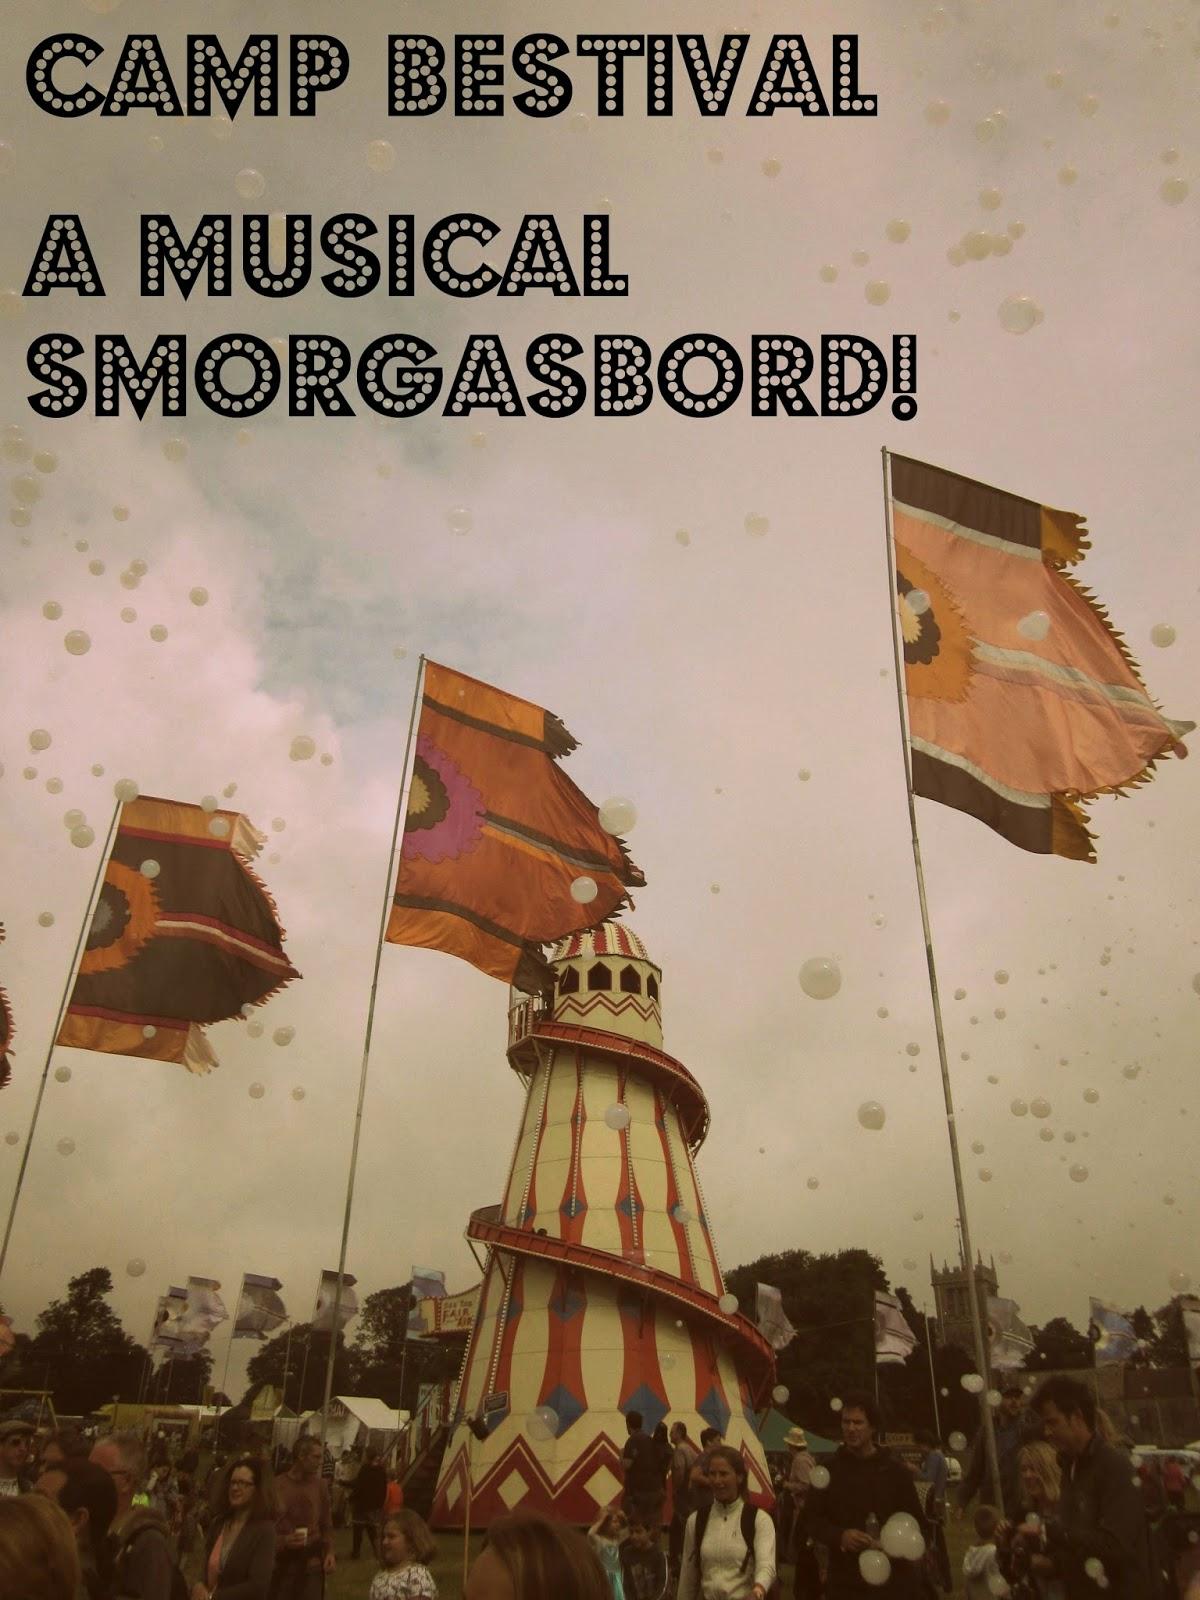 Camp Bestival 2015 - A musical smorgasbord // 76sunflowers